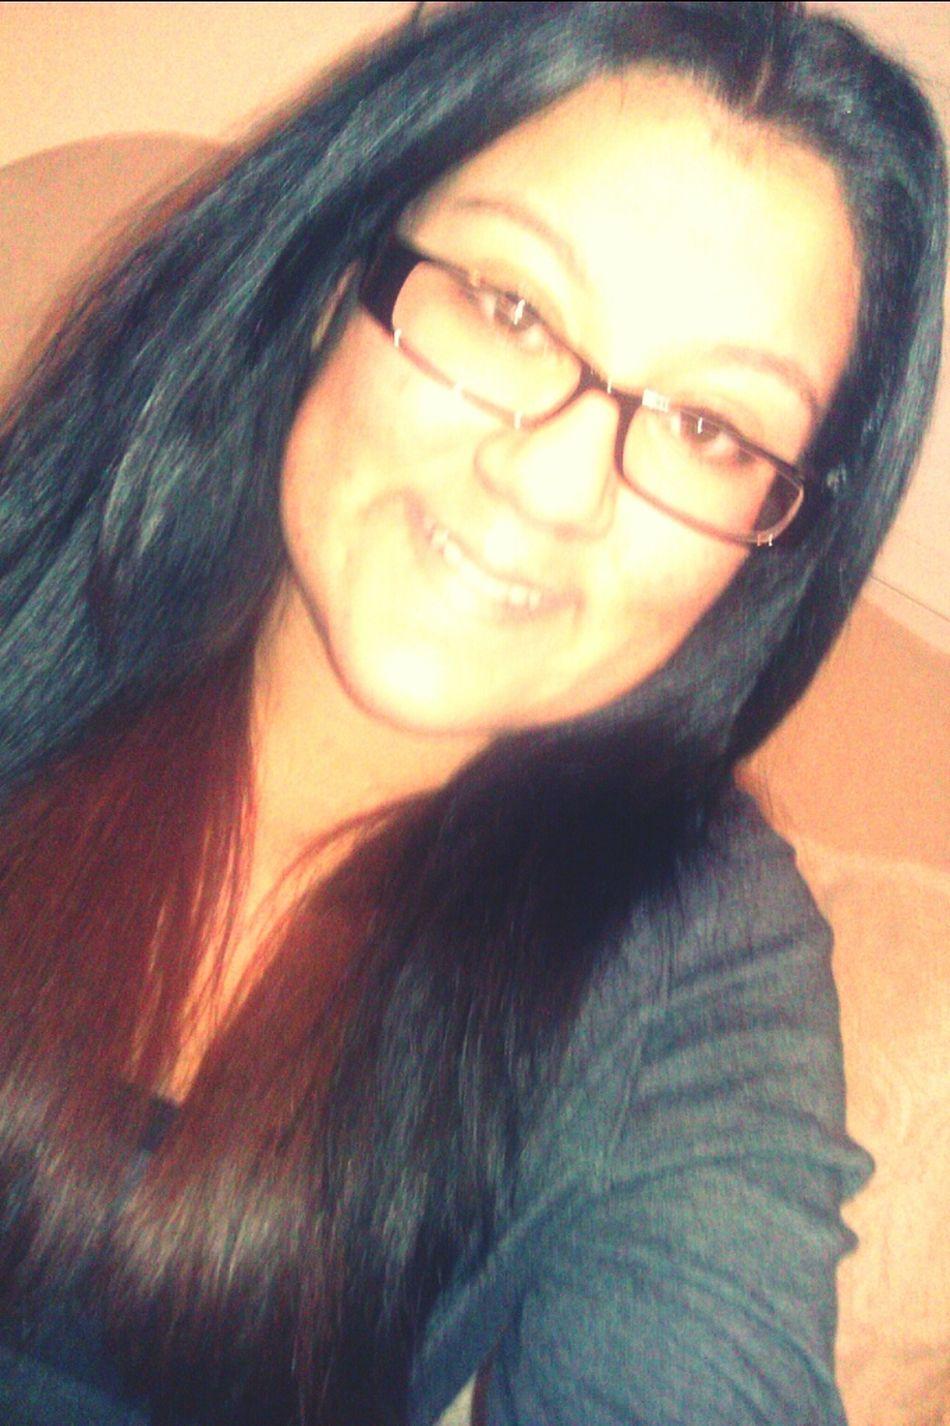 I Like My Hair. Its Hot